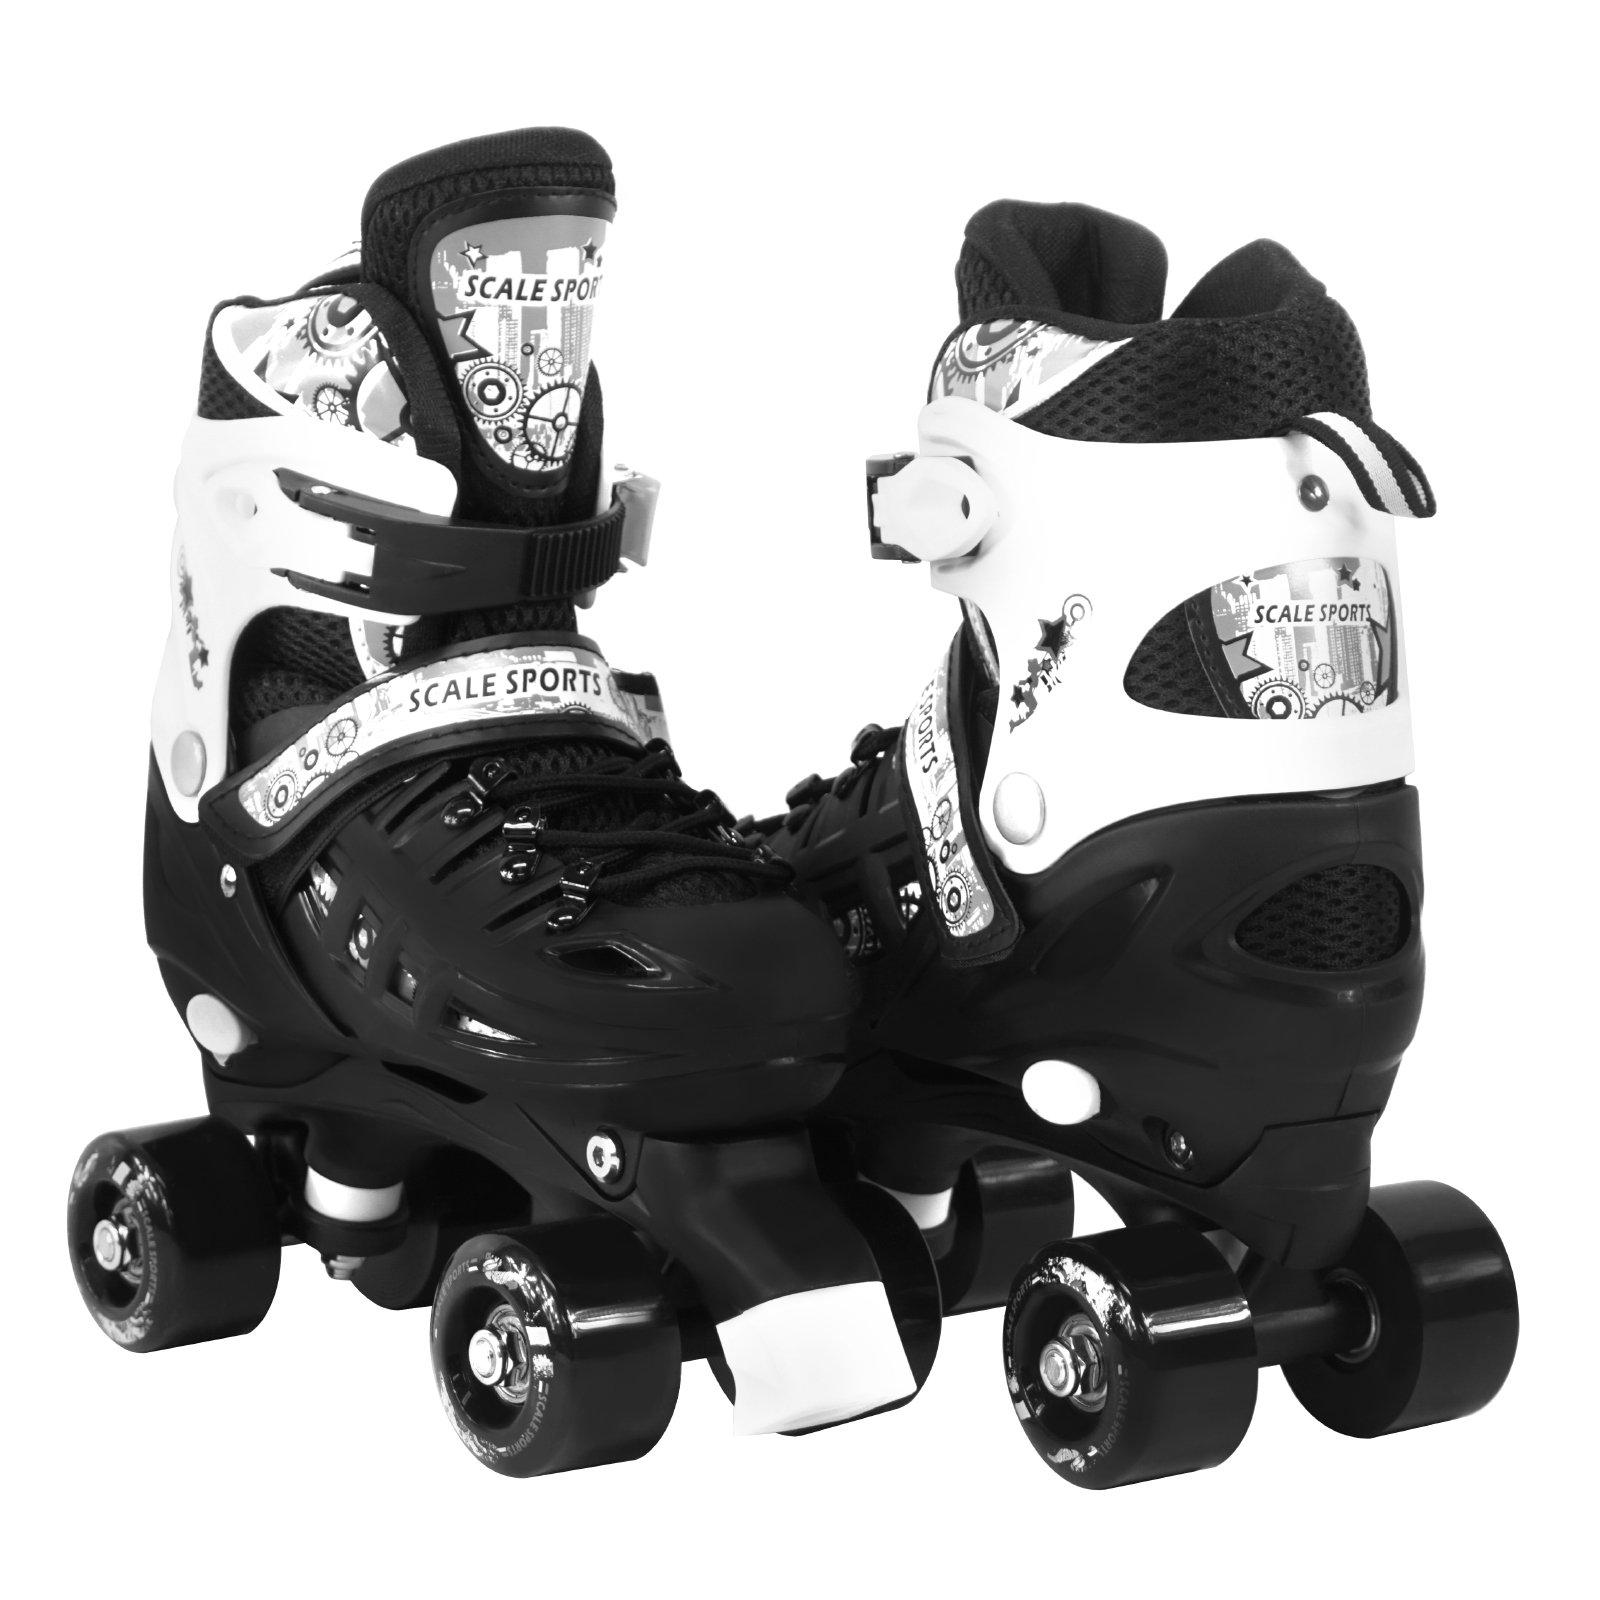 Scale Sports Adjustable Black Quad Roller Skates for Kids Large Sizes for Ladies Teens